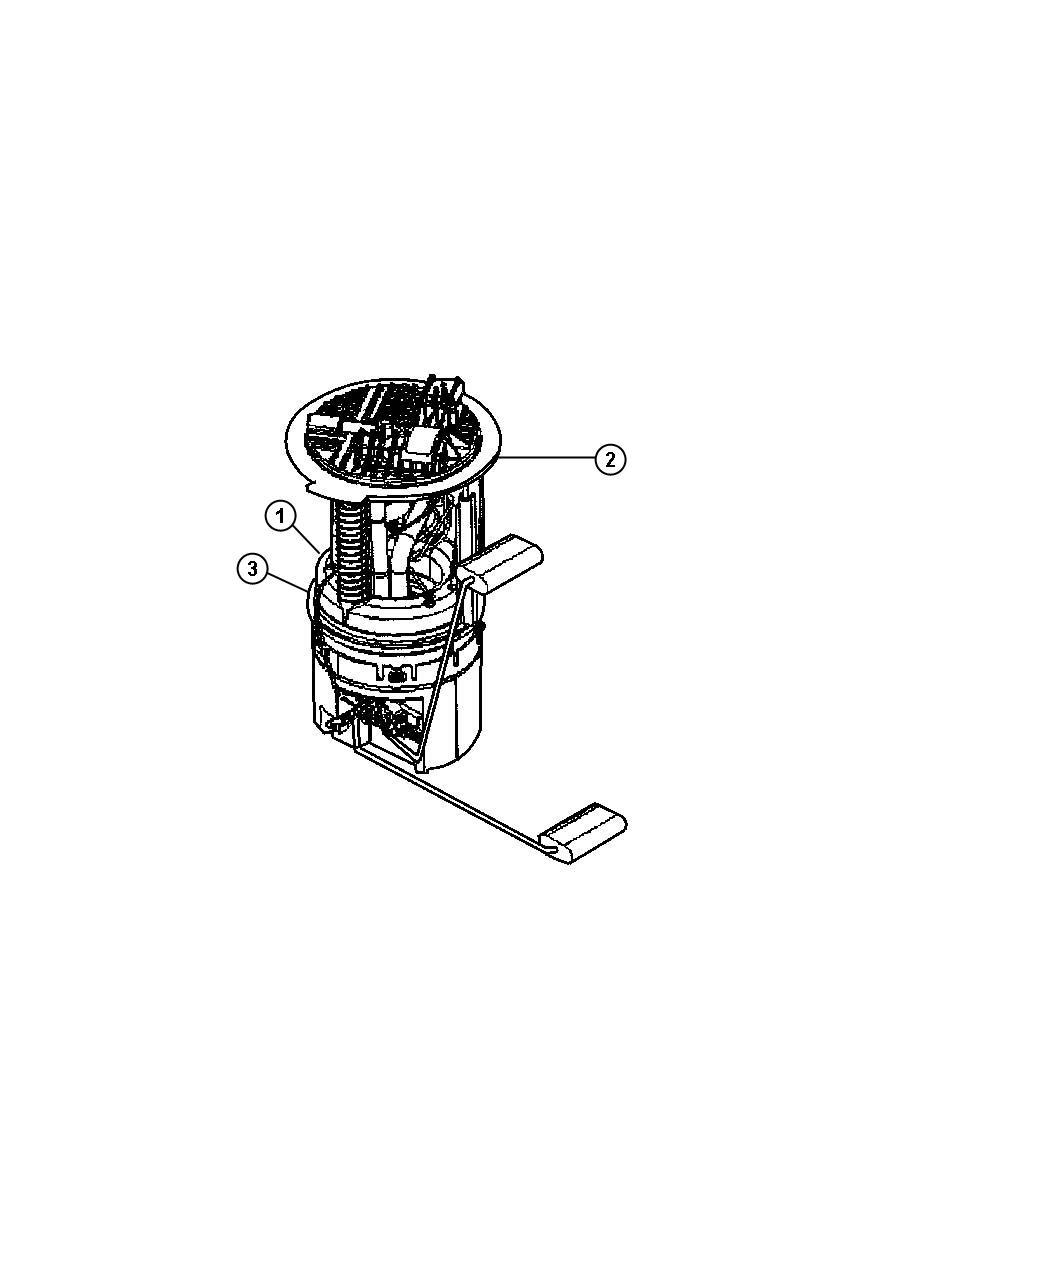 Rl175039ac - Mopar Module  Fuel Tank